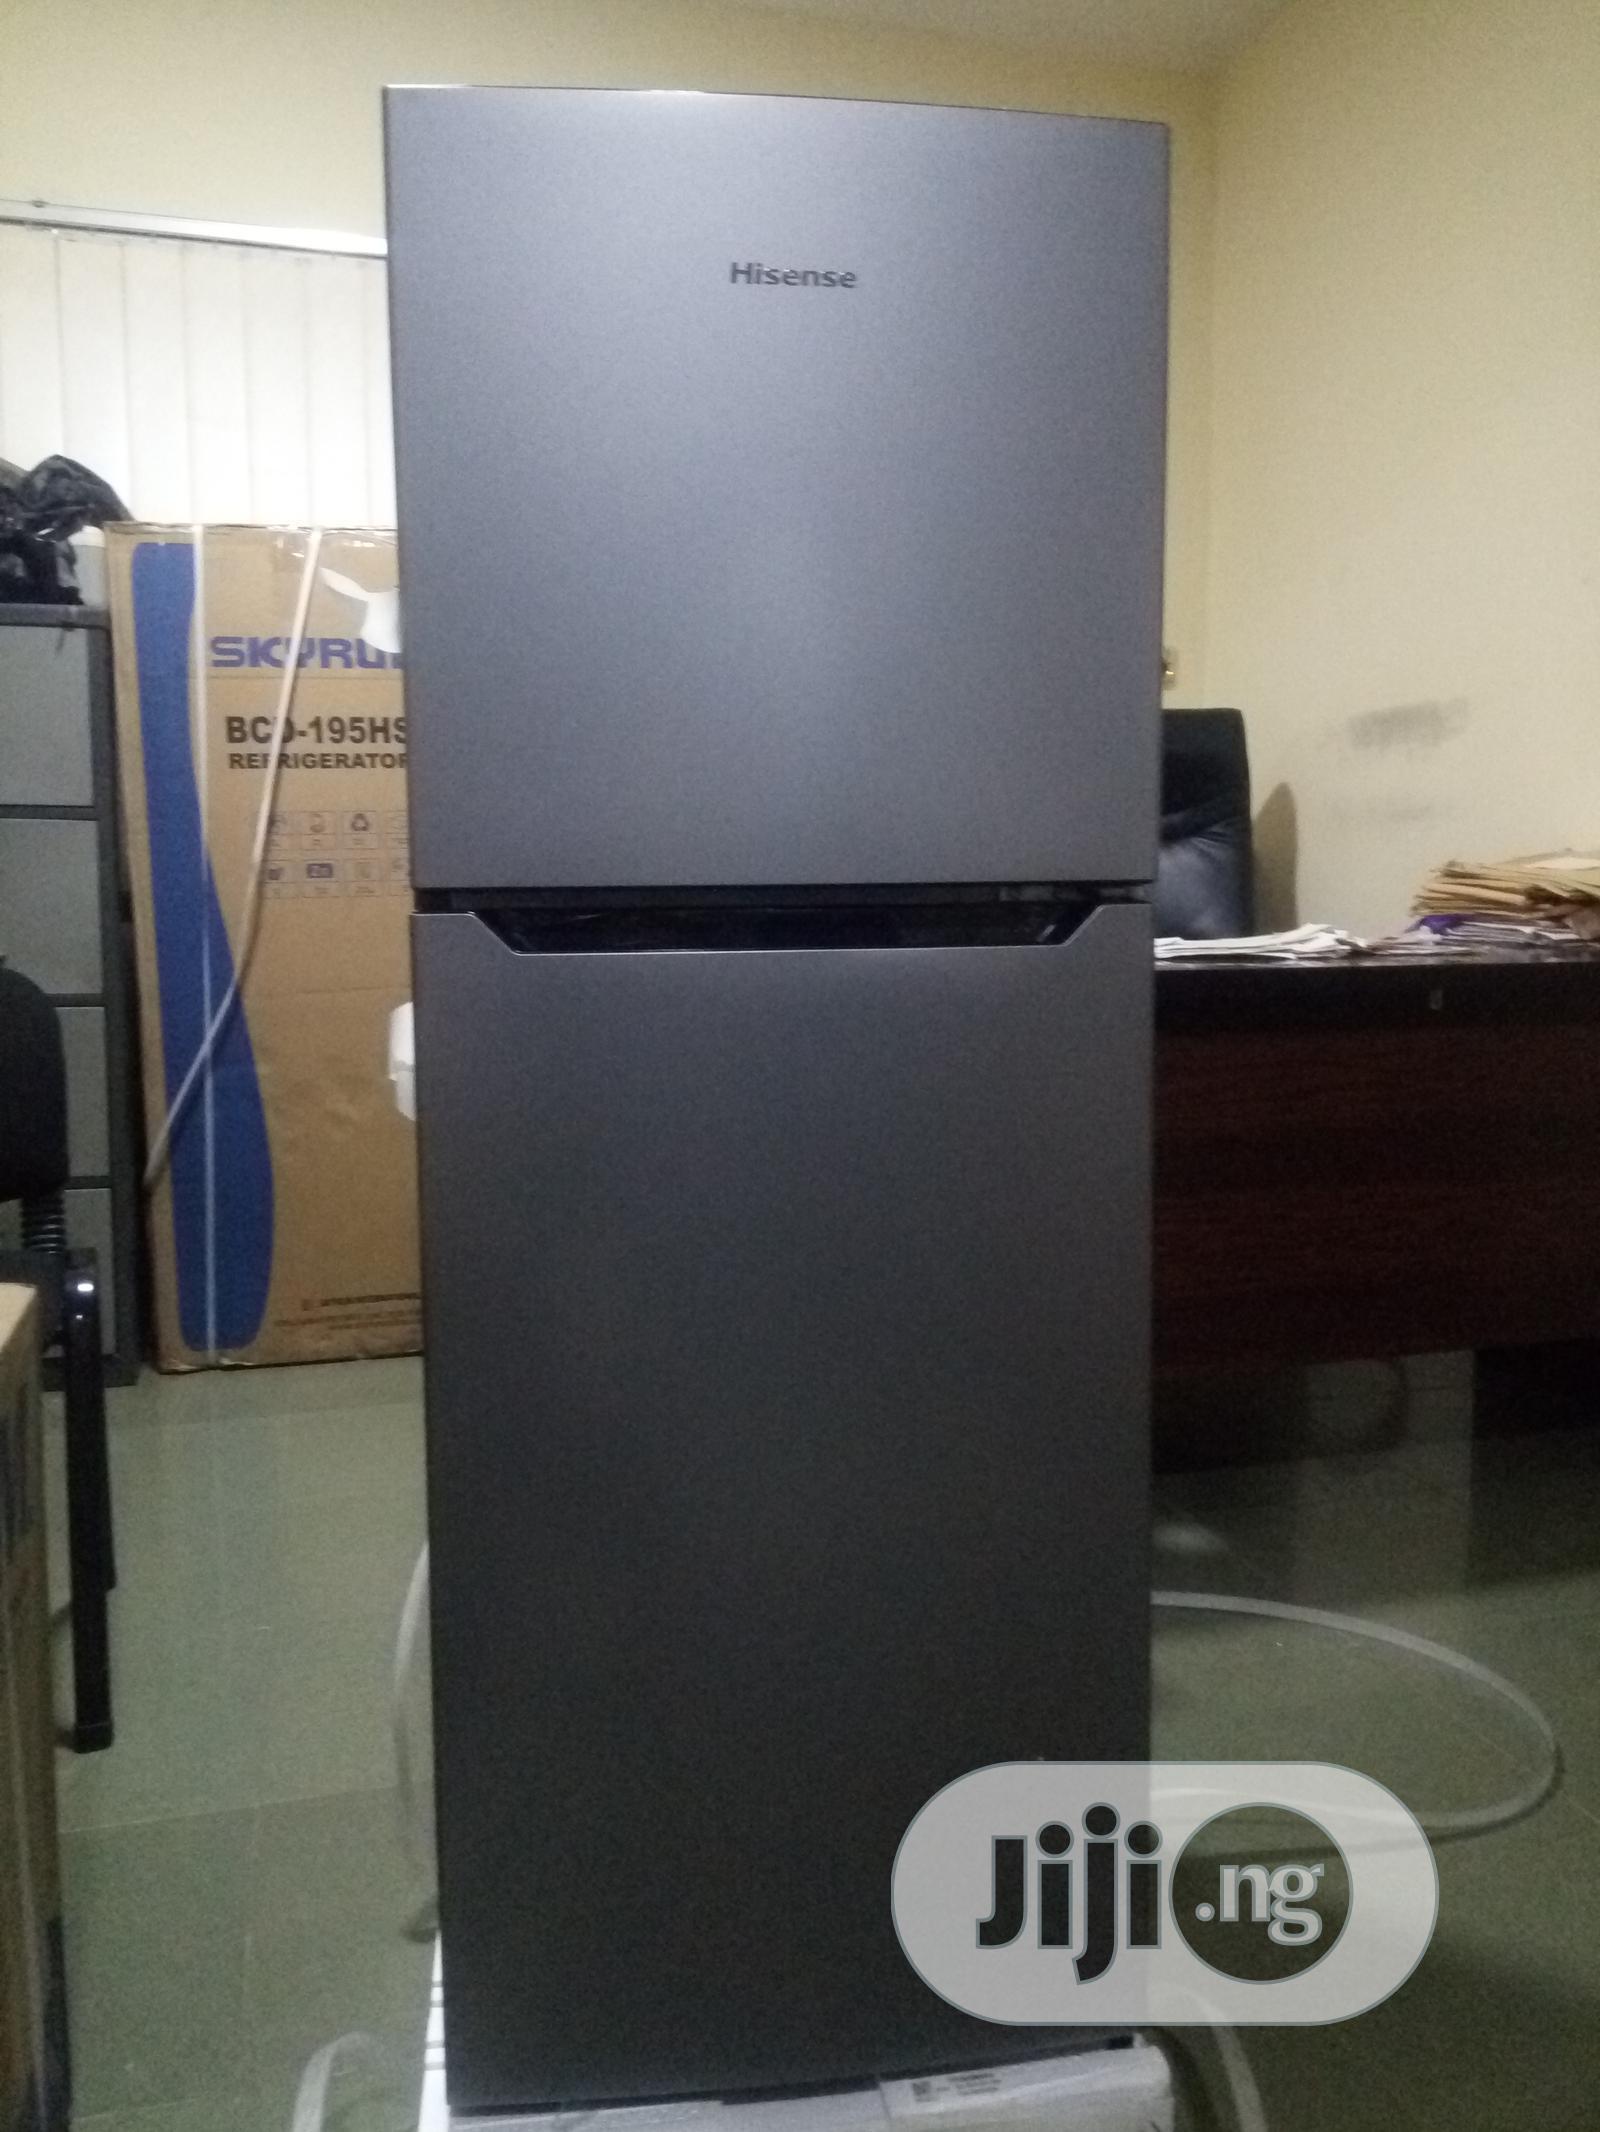 Hisense Refrigerator 130l Double Door Ref-182dr (Visit Www.Reco.Ng)